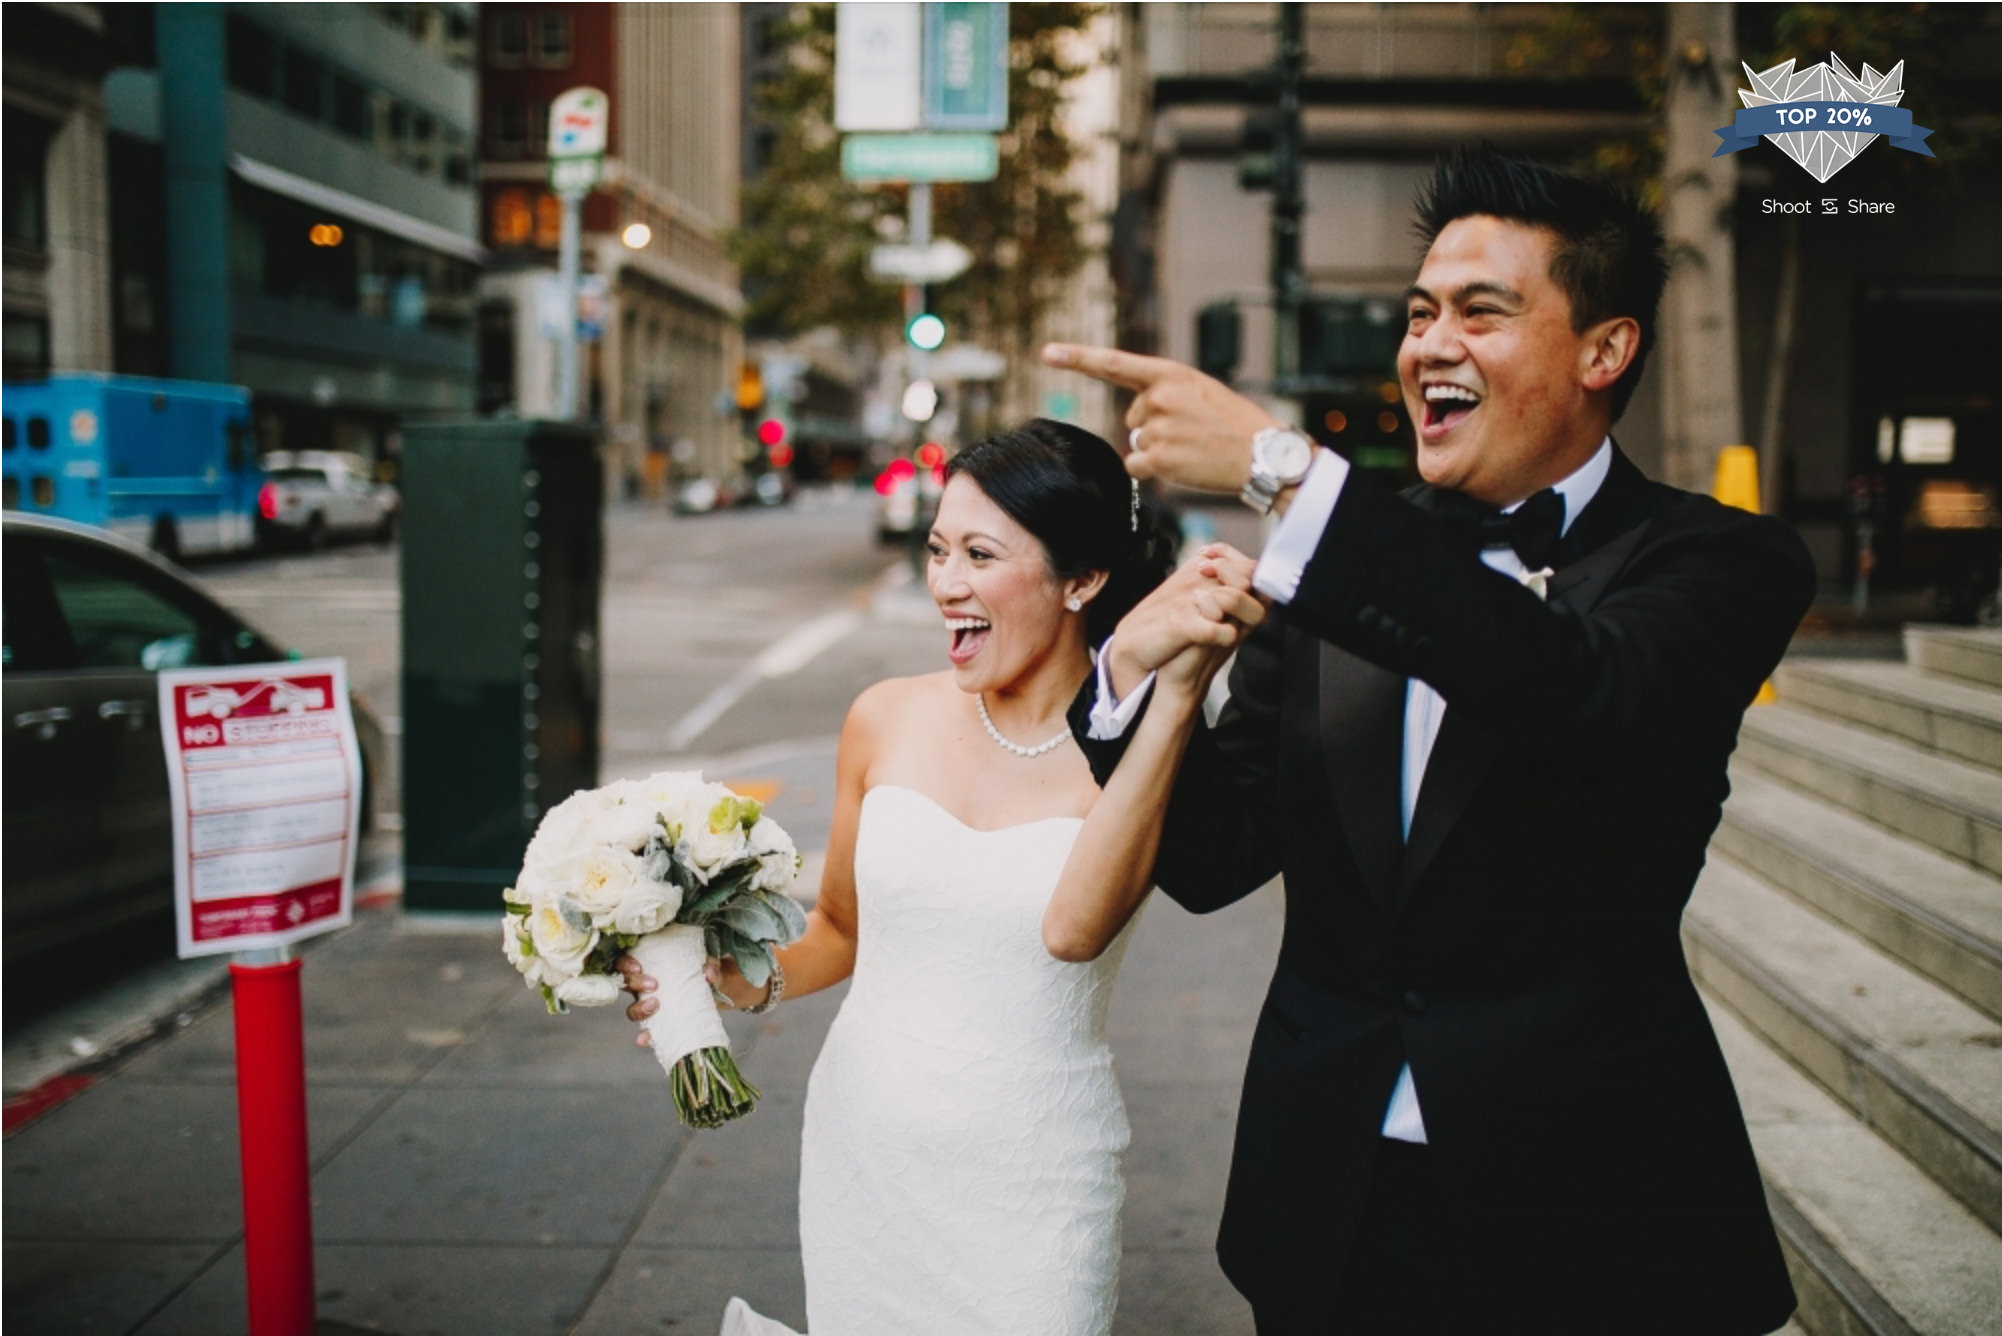 Archer Inspired Photography Shoot and Share Family Wedding Lifestyle Photographer Morgan Hill California San Francisco Bay Area-14.jpg